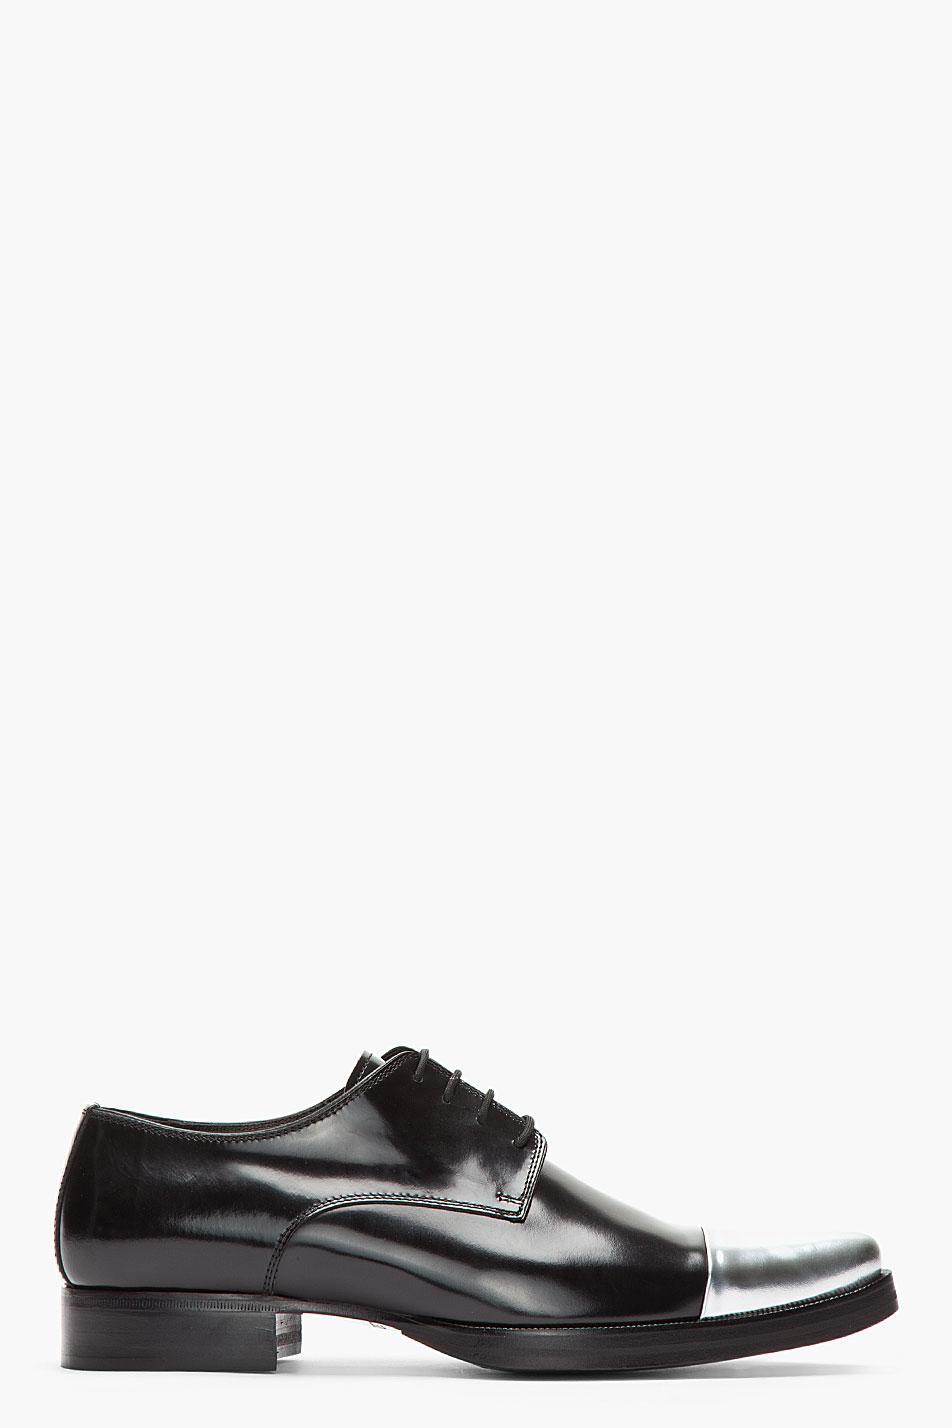 Prada Cap Toe Shoes